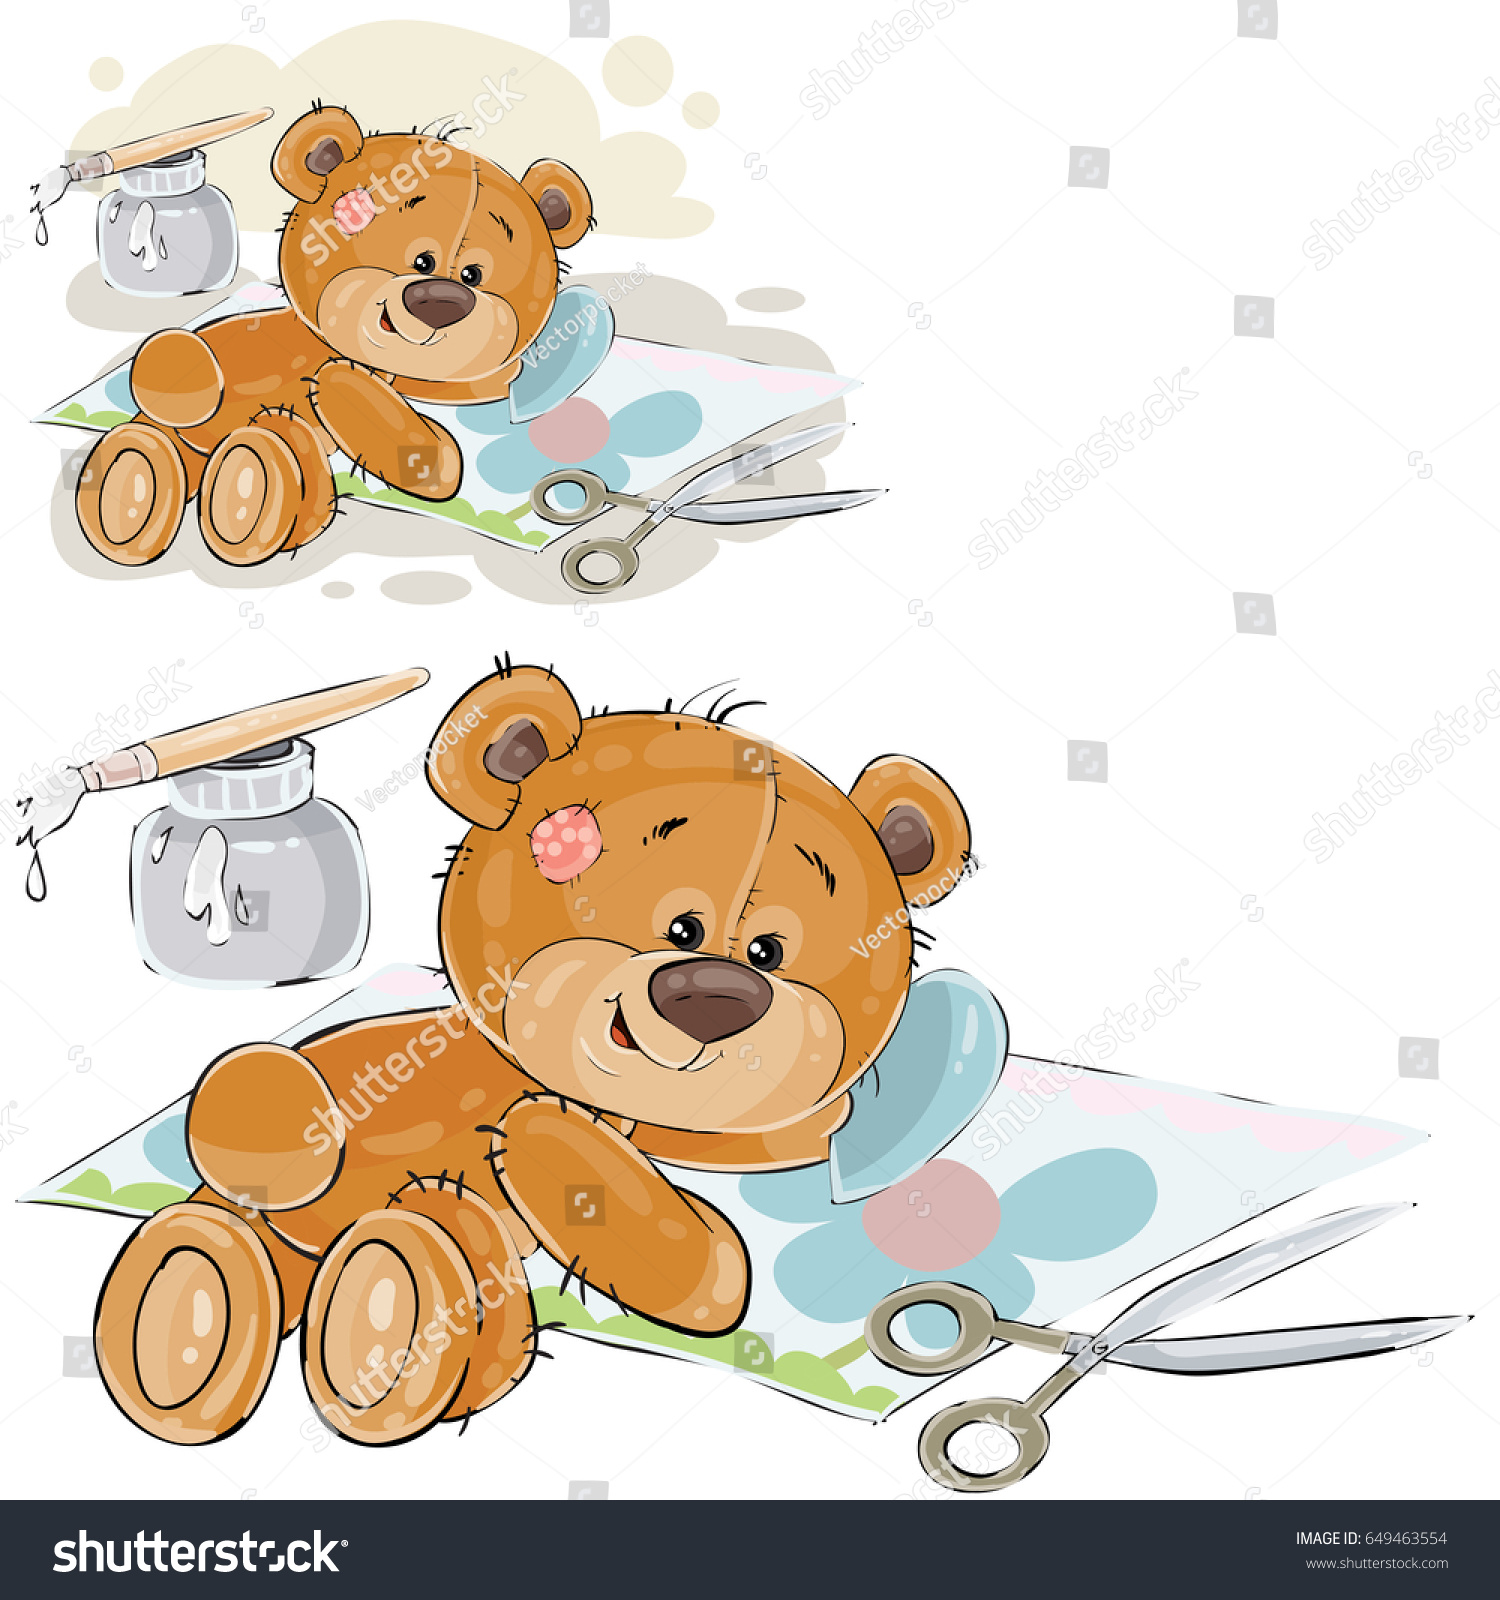 Vector Illustration Brown Teddy Bear Glues Stock Vector 649463554 ...